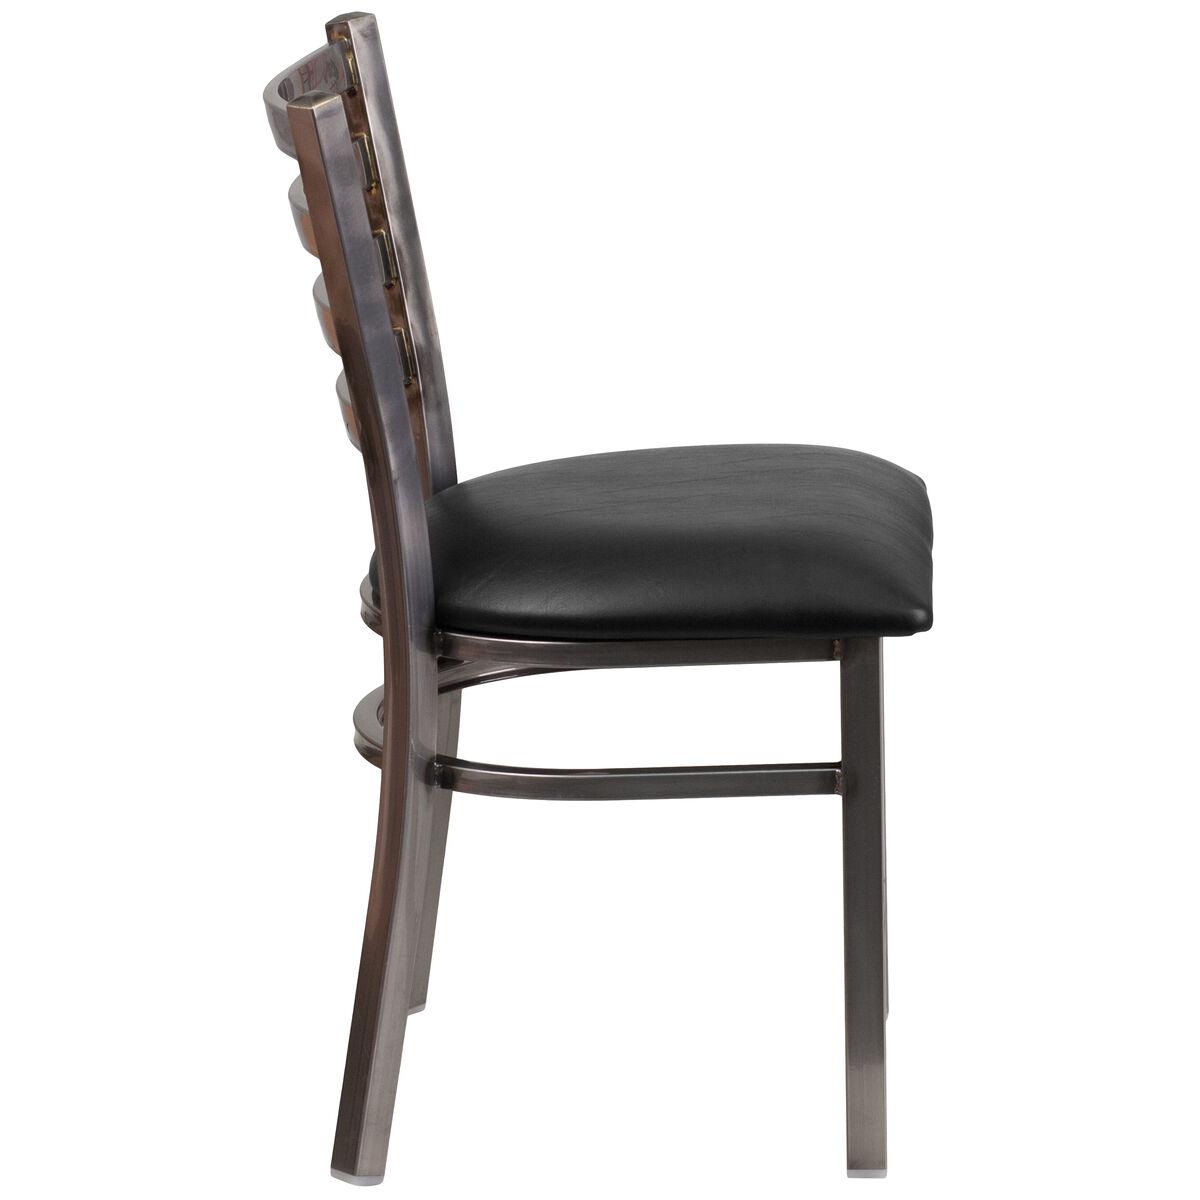 Clear Ladder Chair Black Seat Bfdh 6147clrladbk Tdr